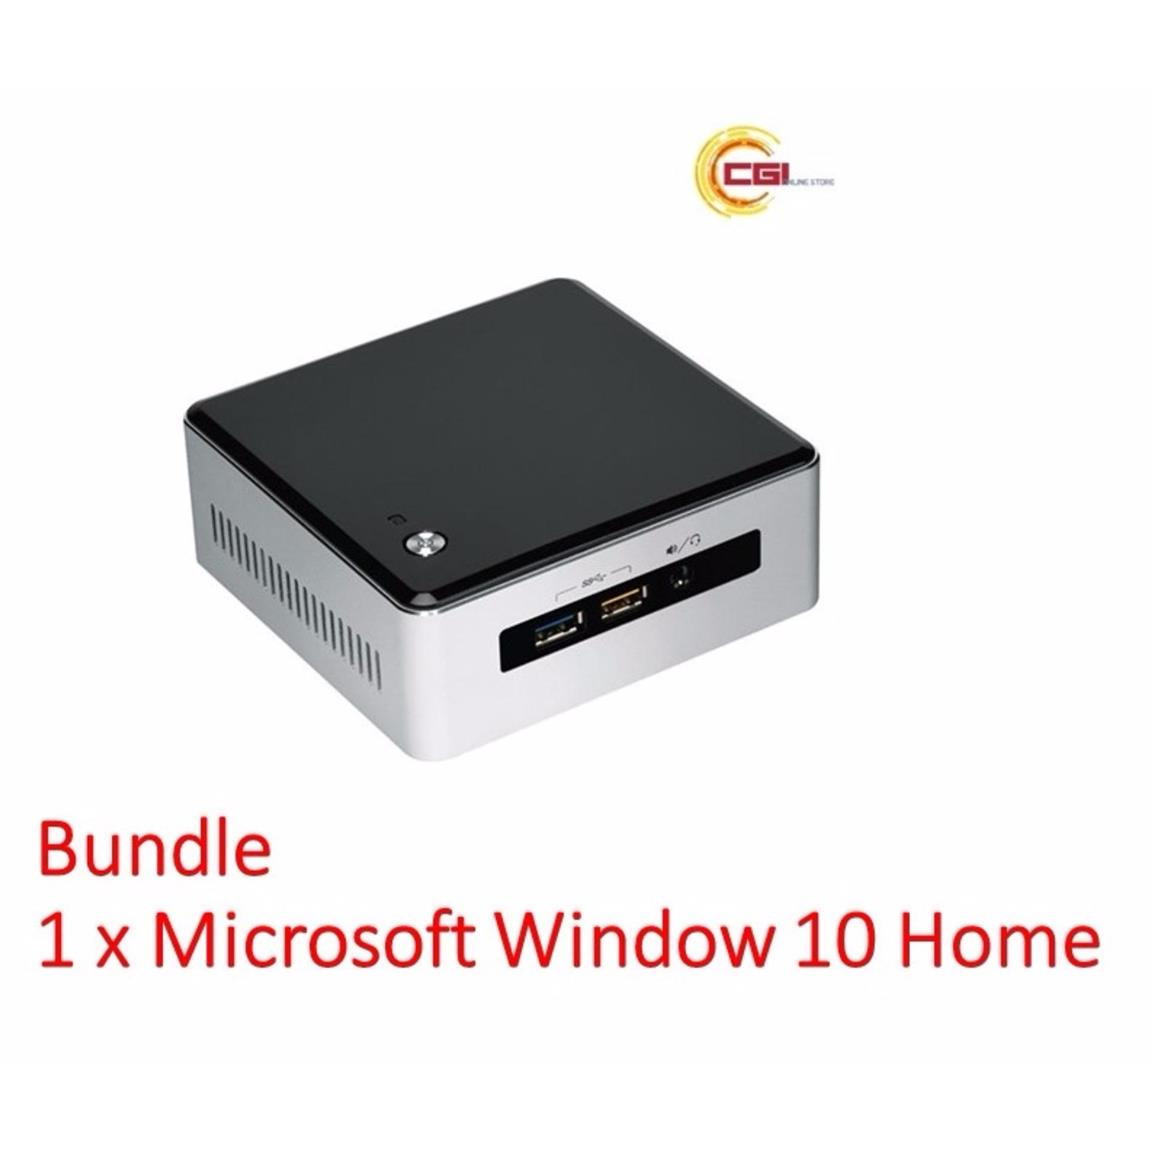 Microsoft Windows 10 Home Zromtk 64 Bit Oem Original Edition Dsp